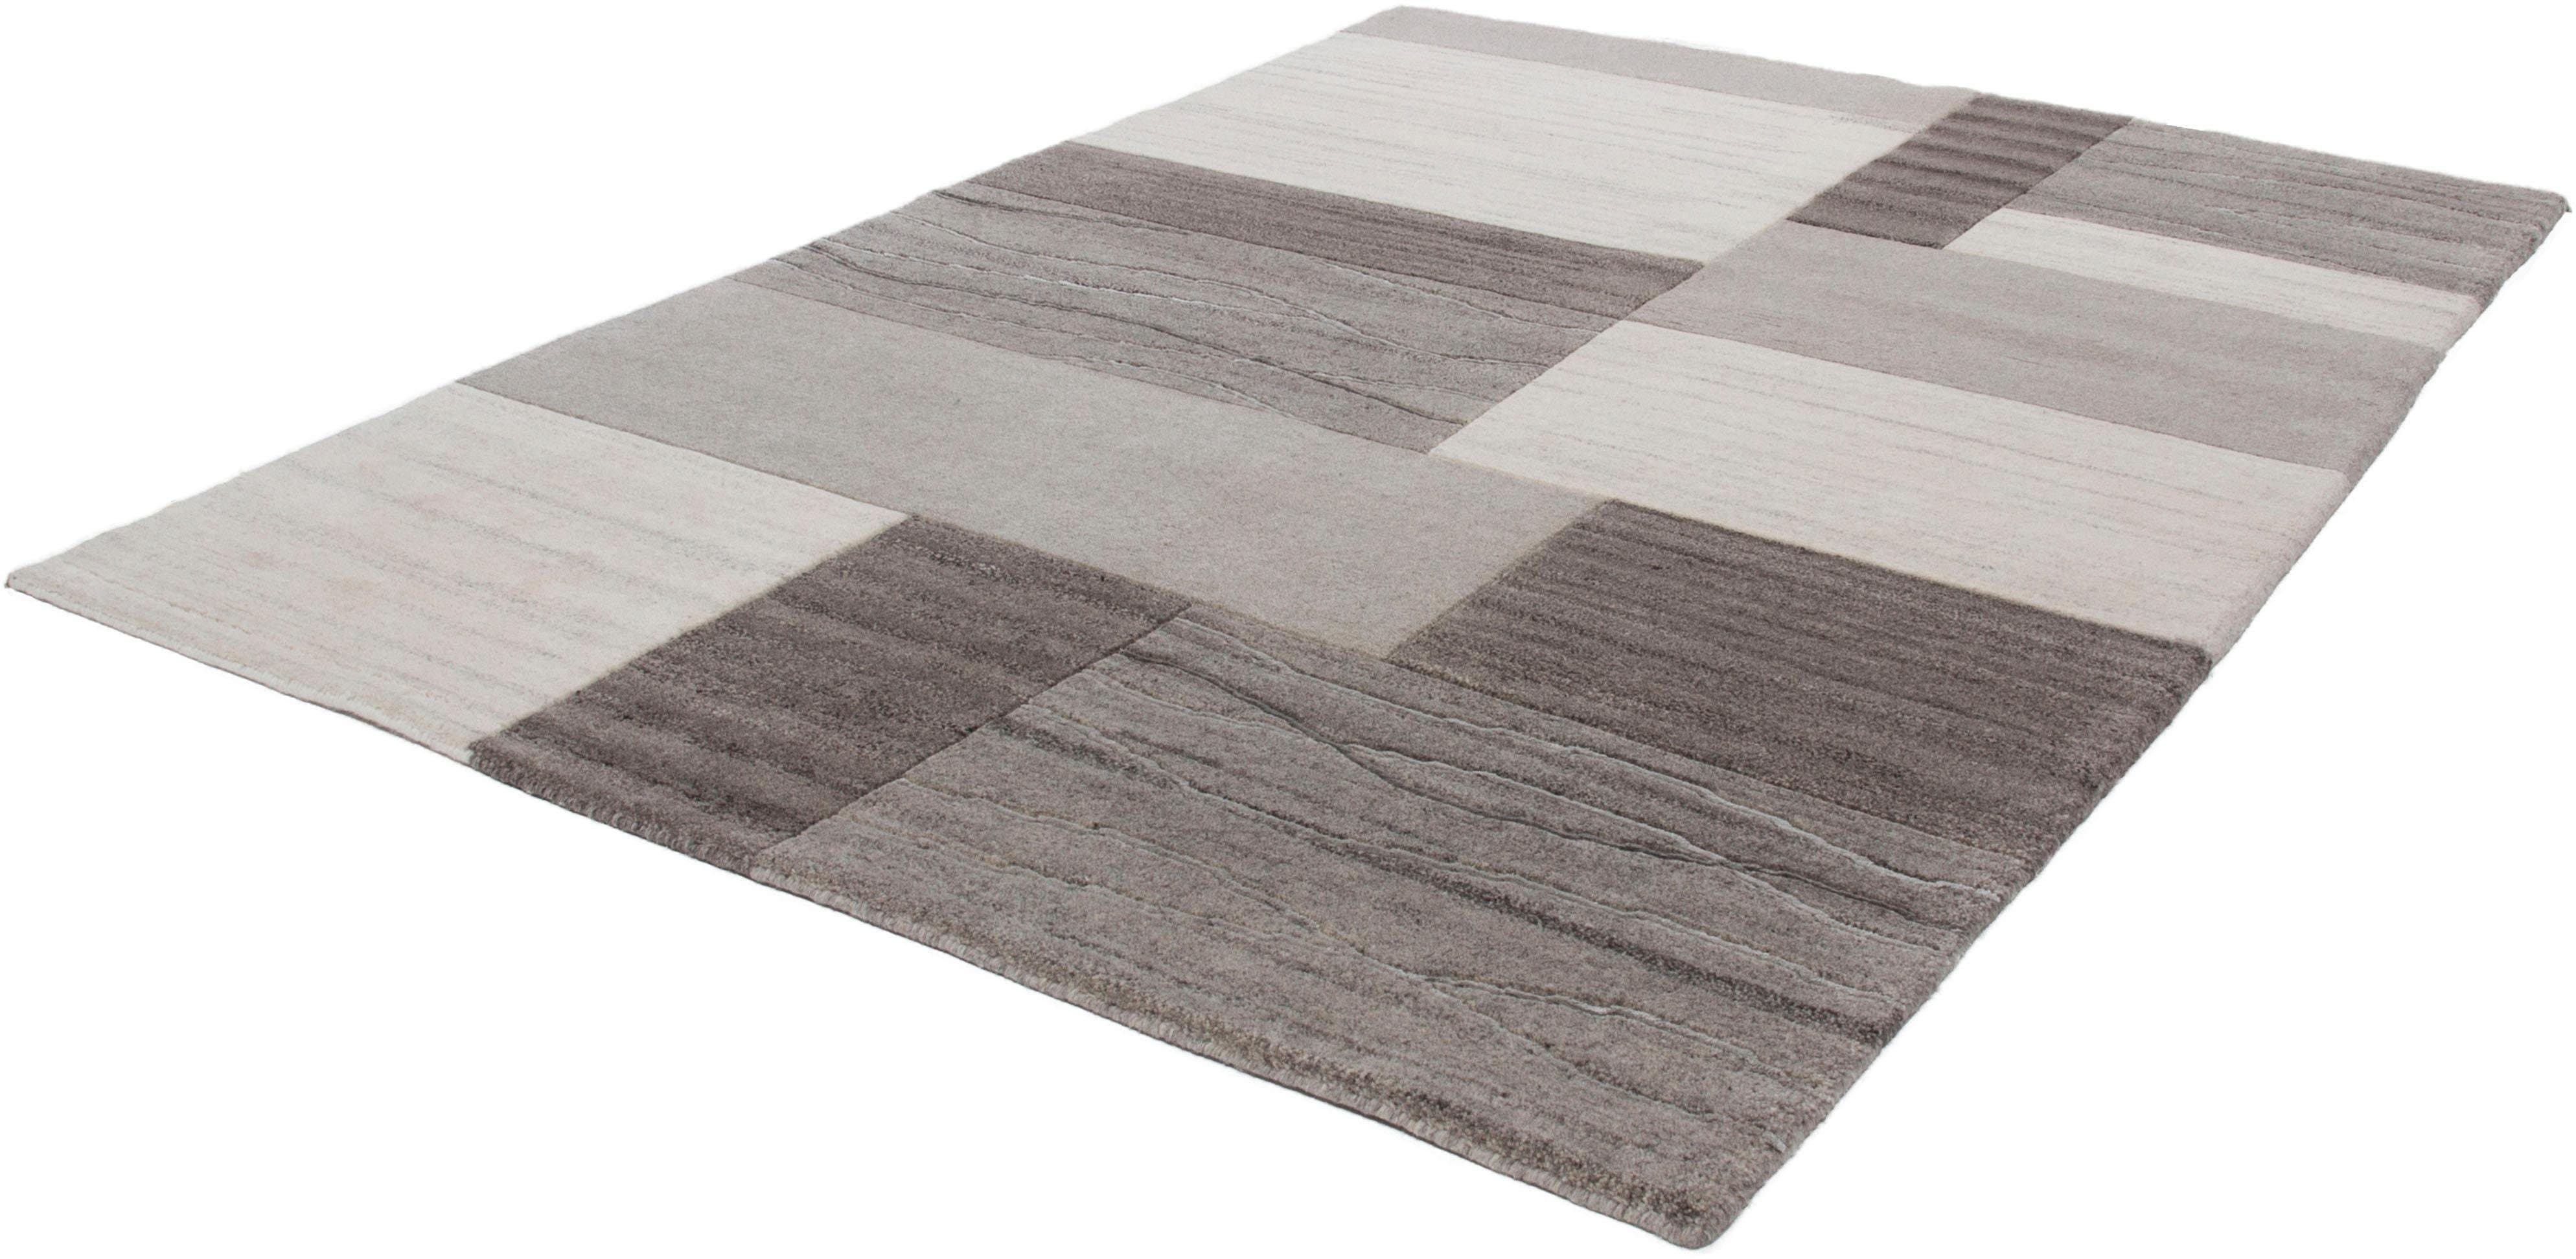 Teppich Foy 1001 calo-deluxe rechteckig Höhe 18 mm manuell geknüpft